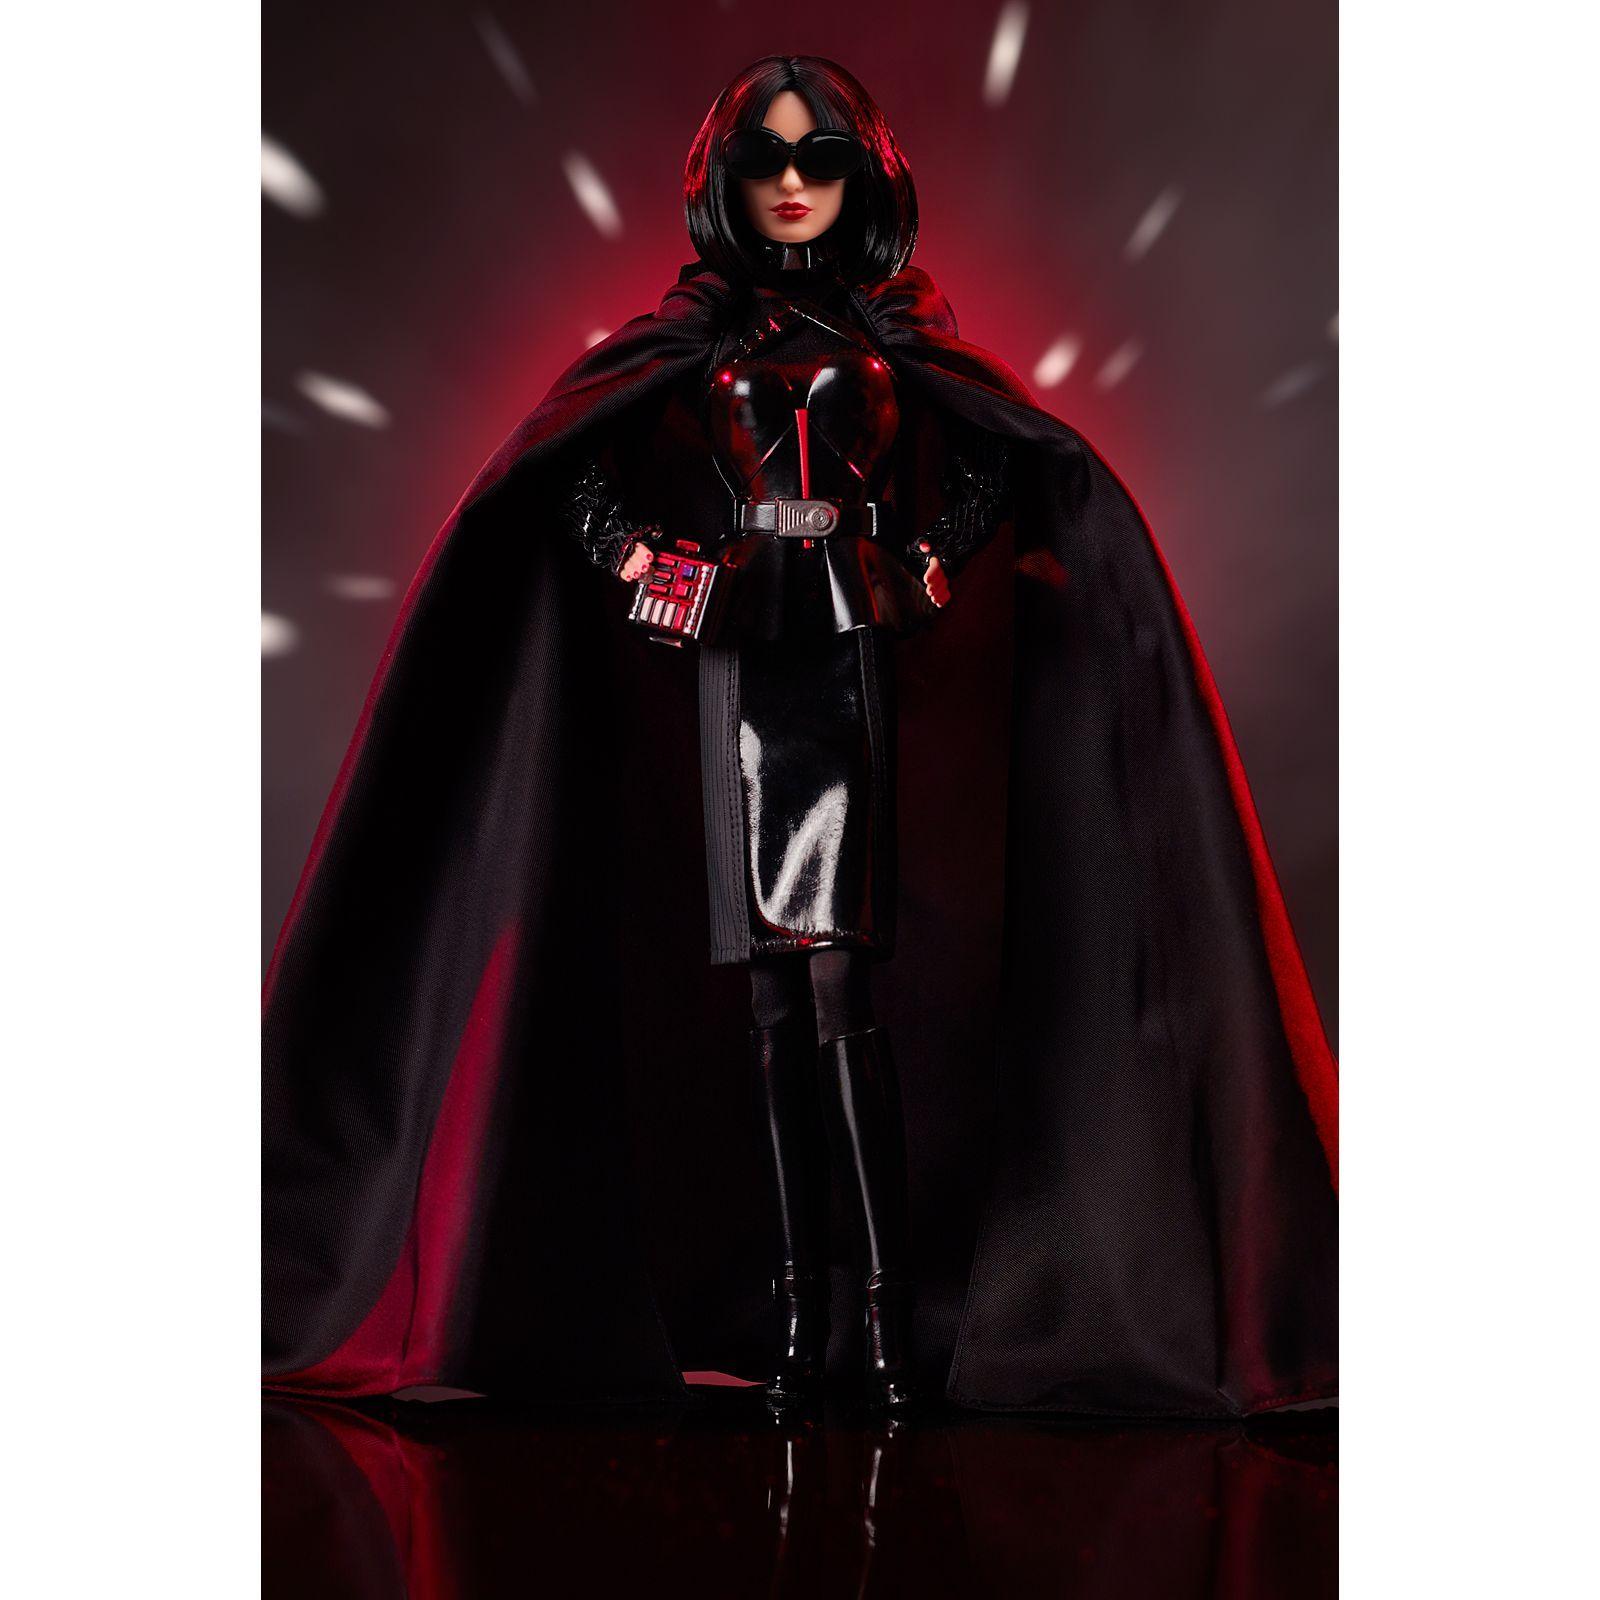 Barbie as Darth Vader Star Wars x Doll GHT80 Mattel 2019 NRFB